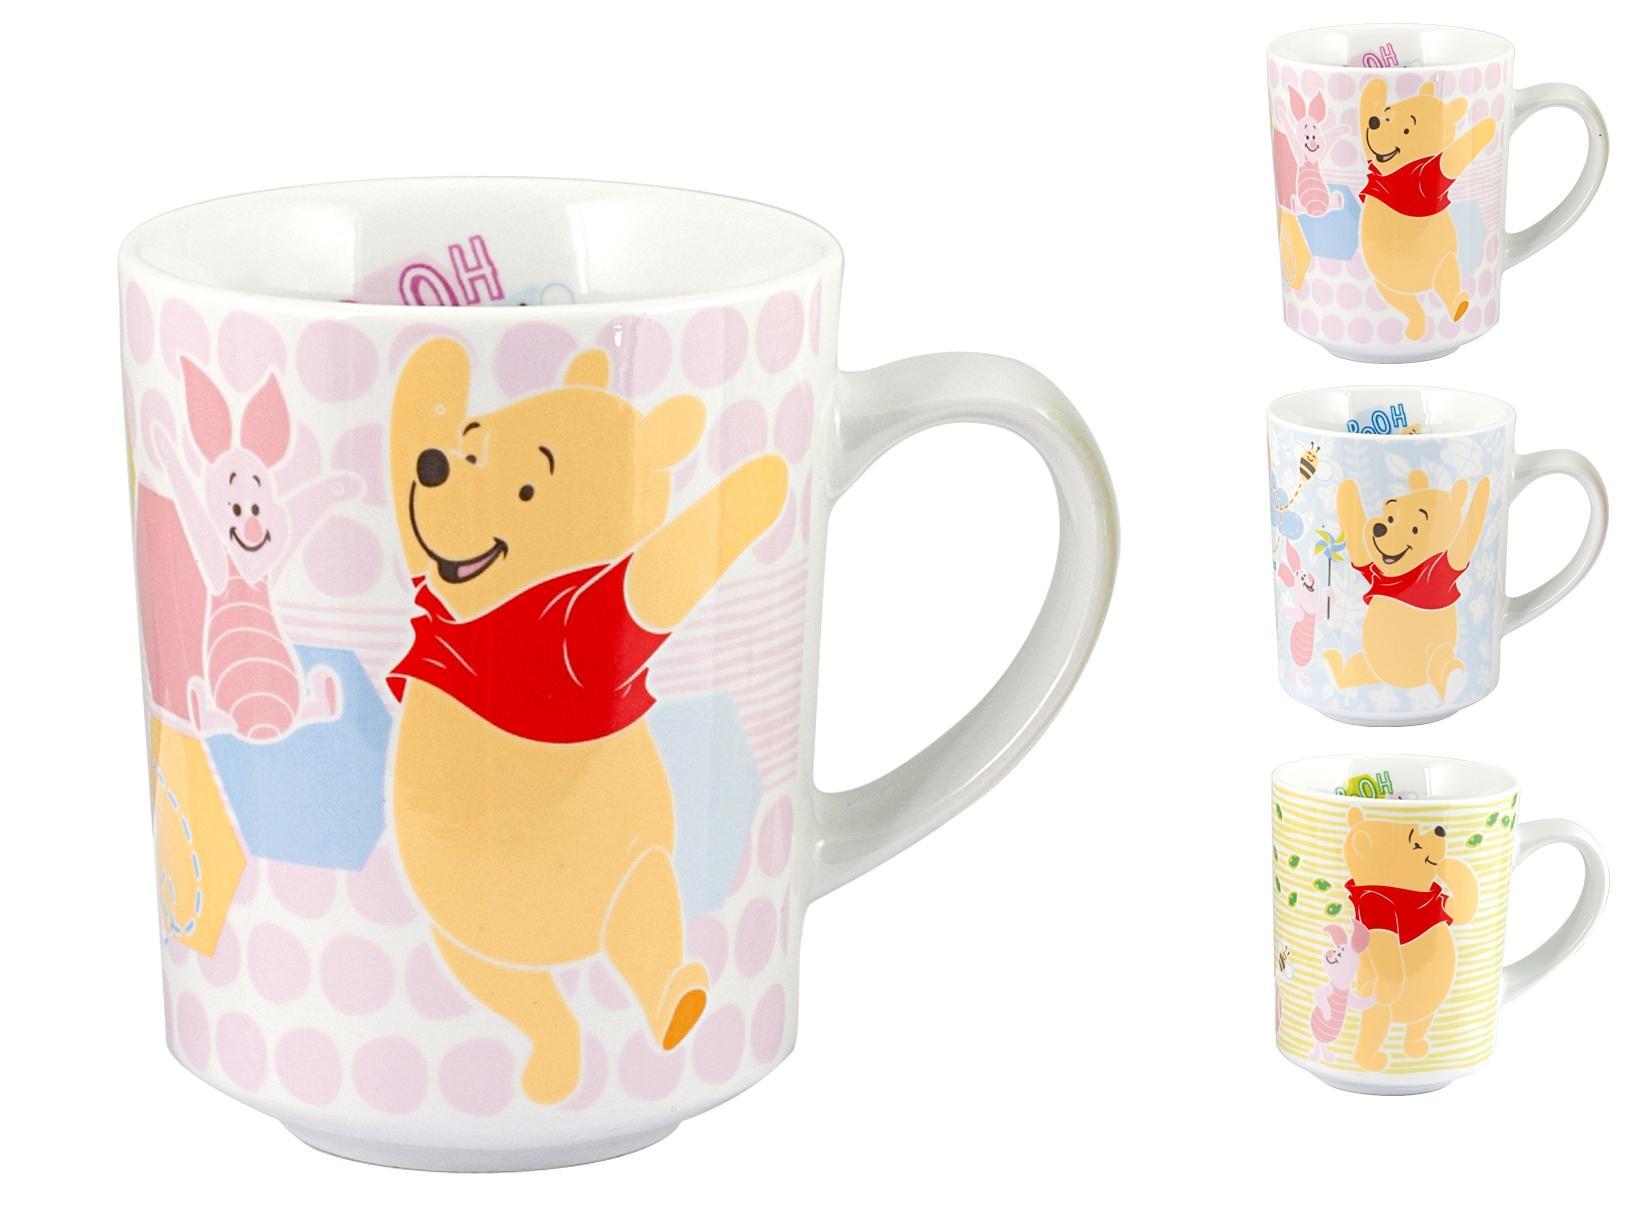 Tavola Winnie Cc360 Mug Colazione Preparazione Home Set 6 Sweet Arredo Disney JTlF1Kc